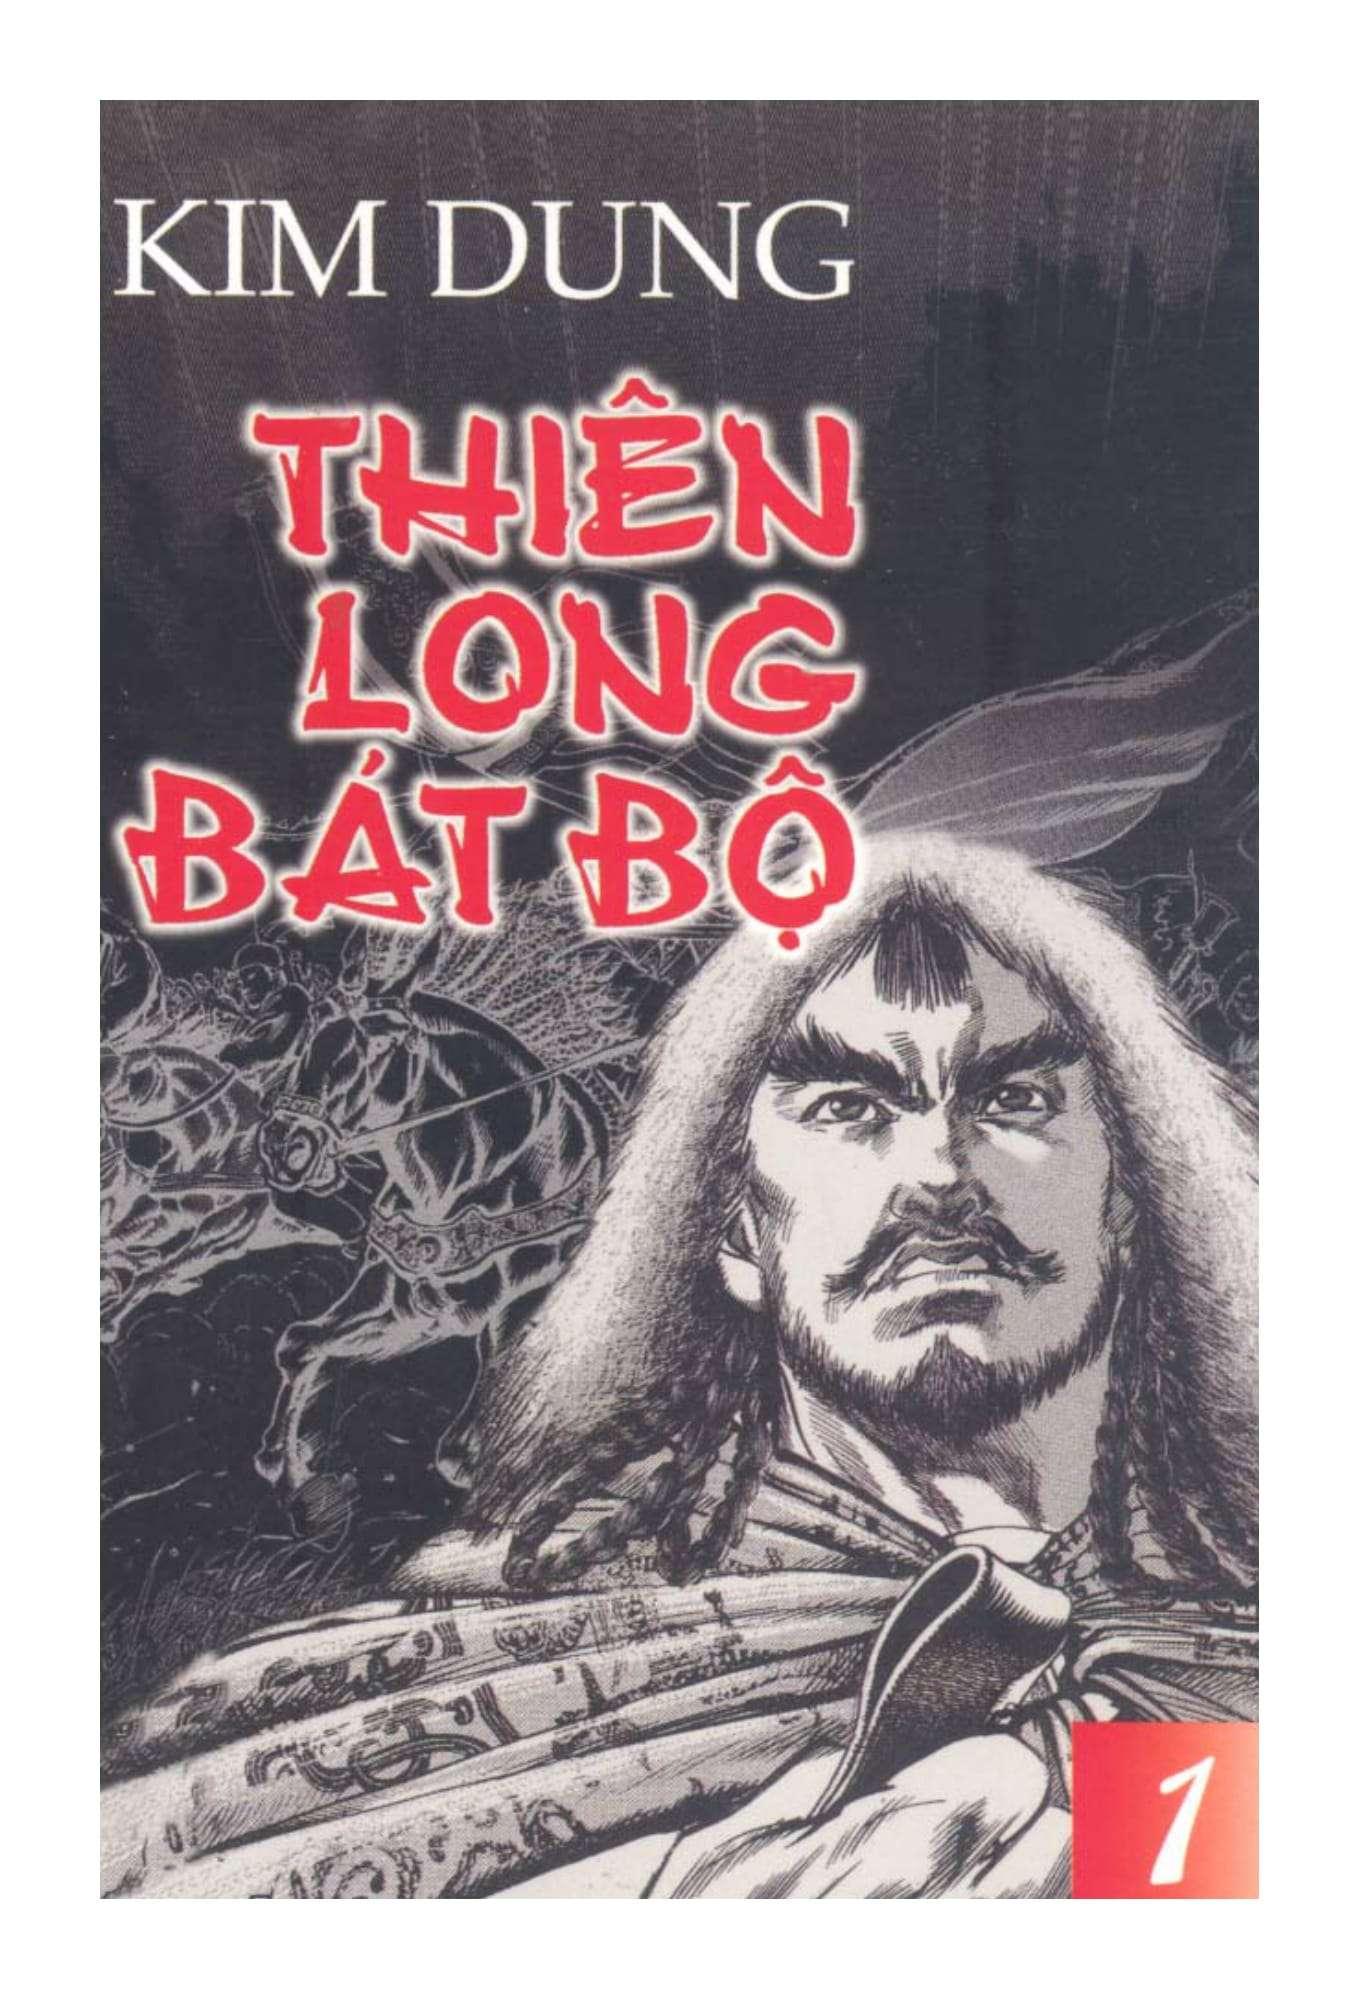 thien-long-bat-bo---kim-dung